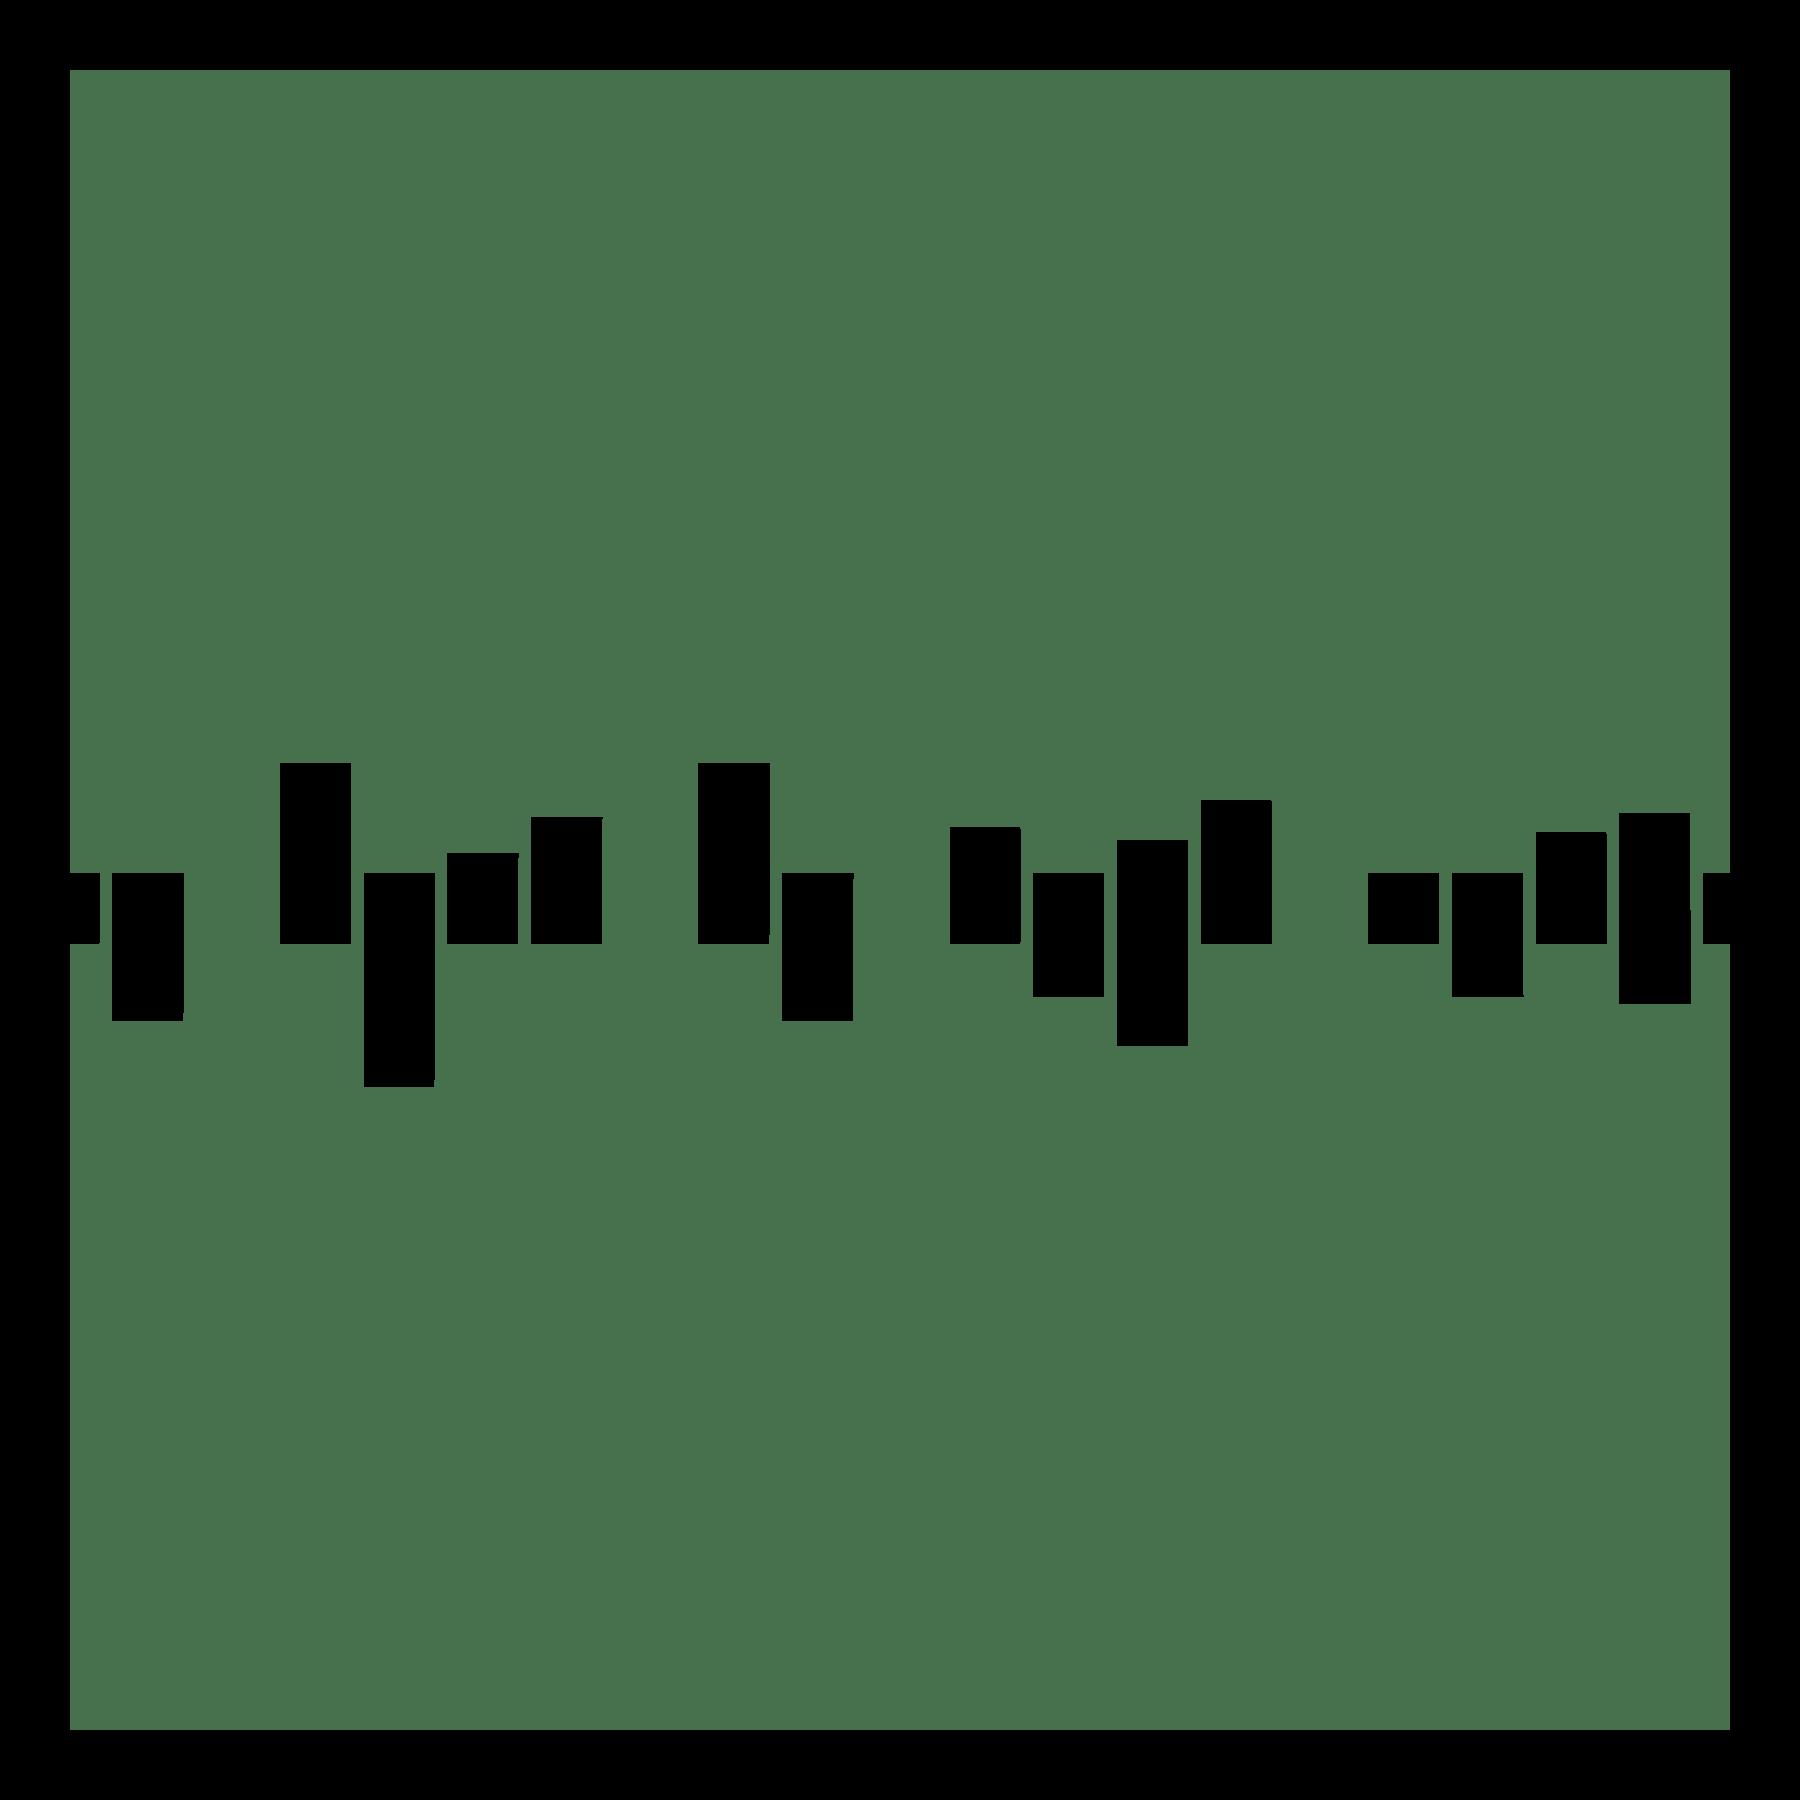 Soundscape Forty Five Symbols